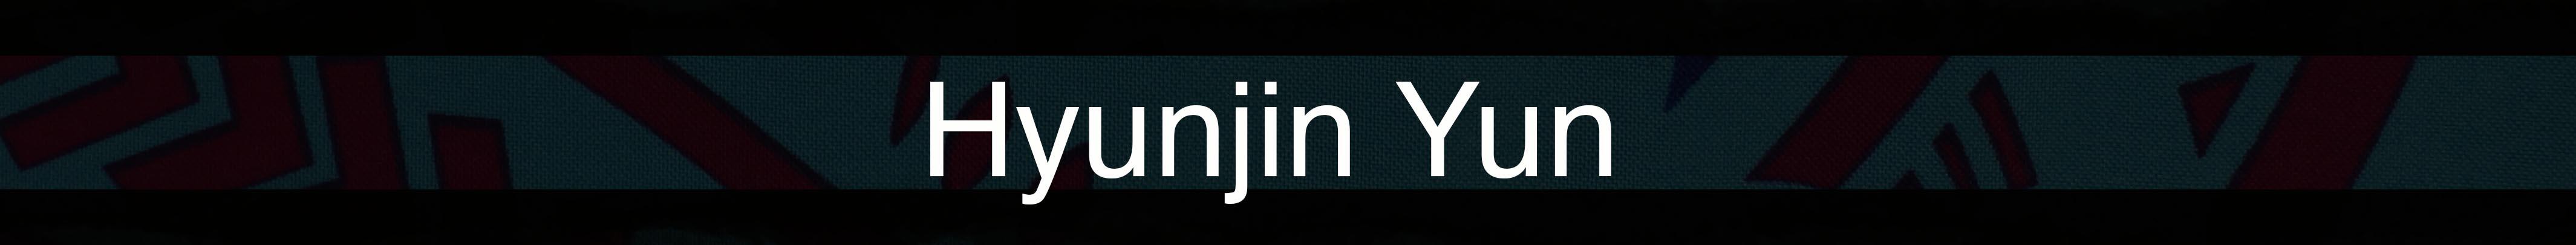 website Hyunjin Yun